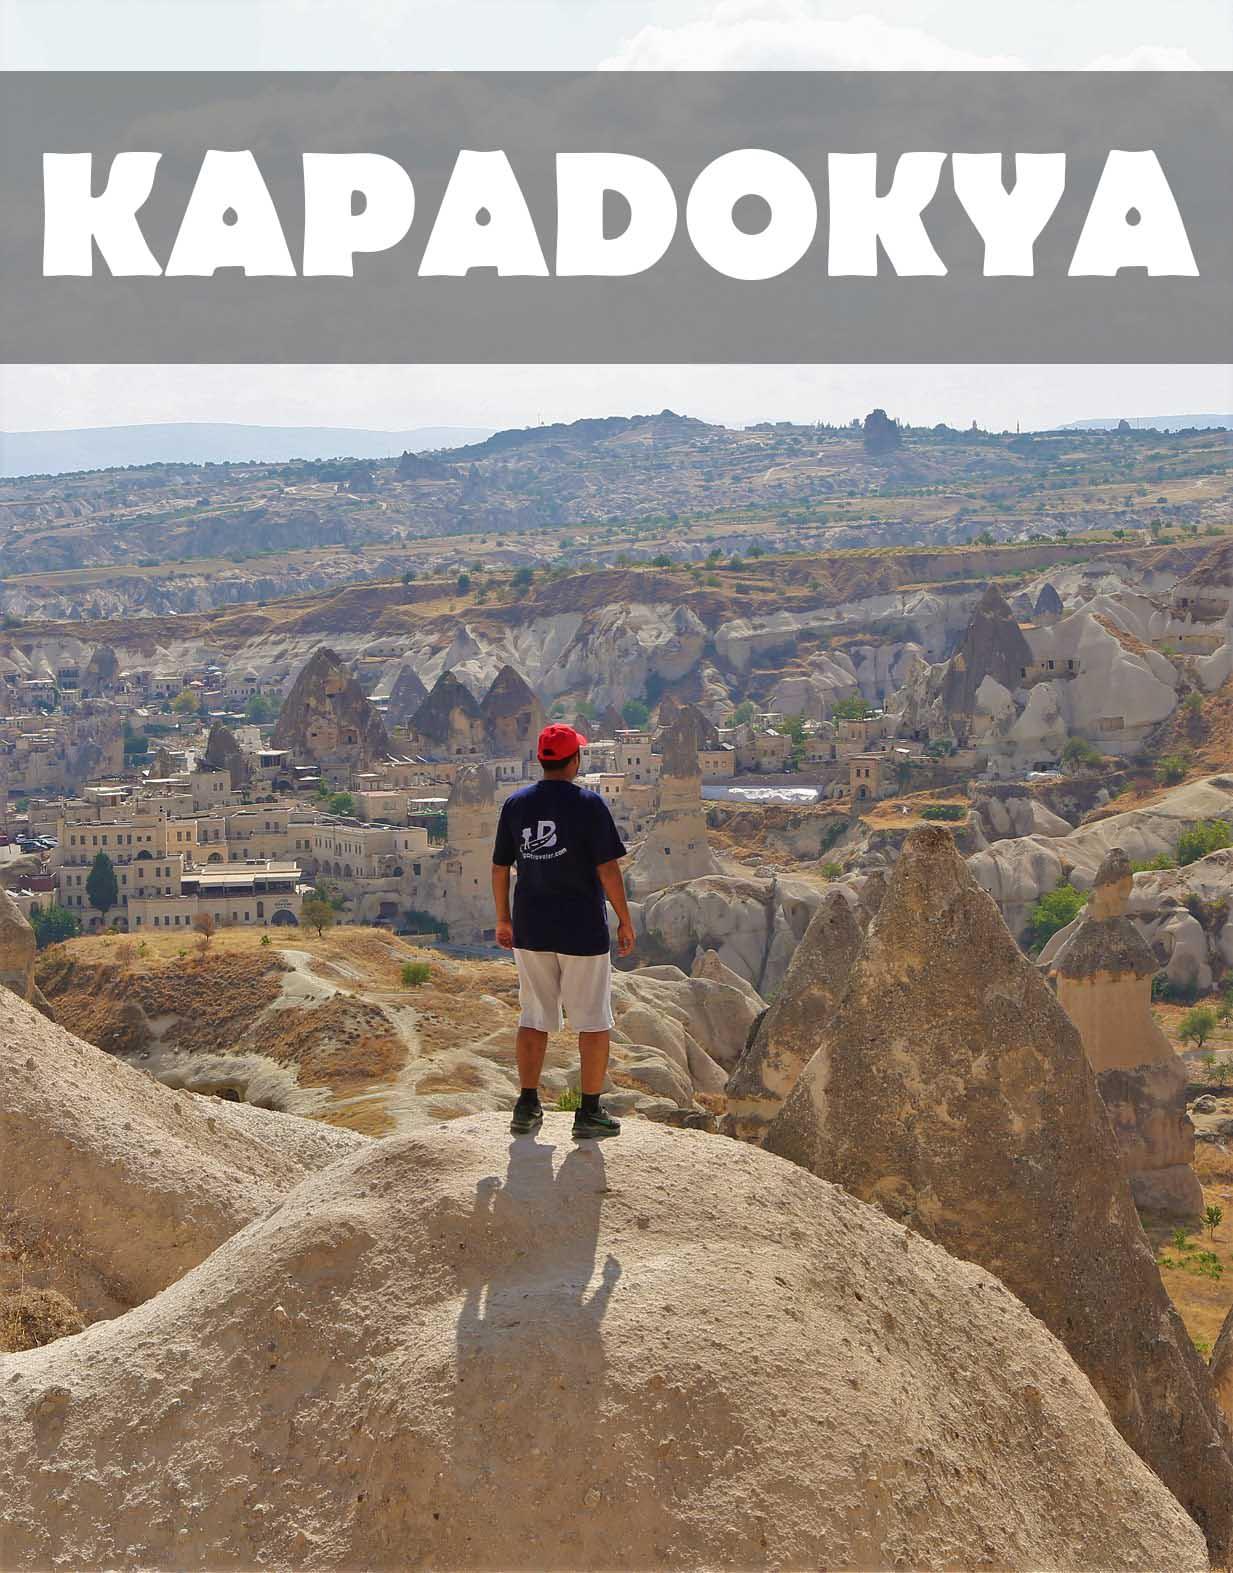 Kapadoky Capaducia turkey beingatraveler BILAL AZAM